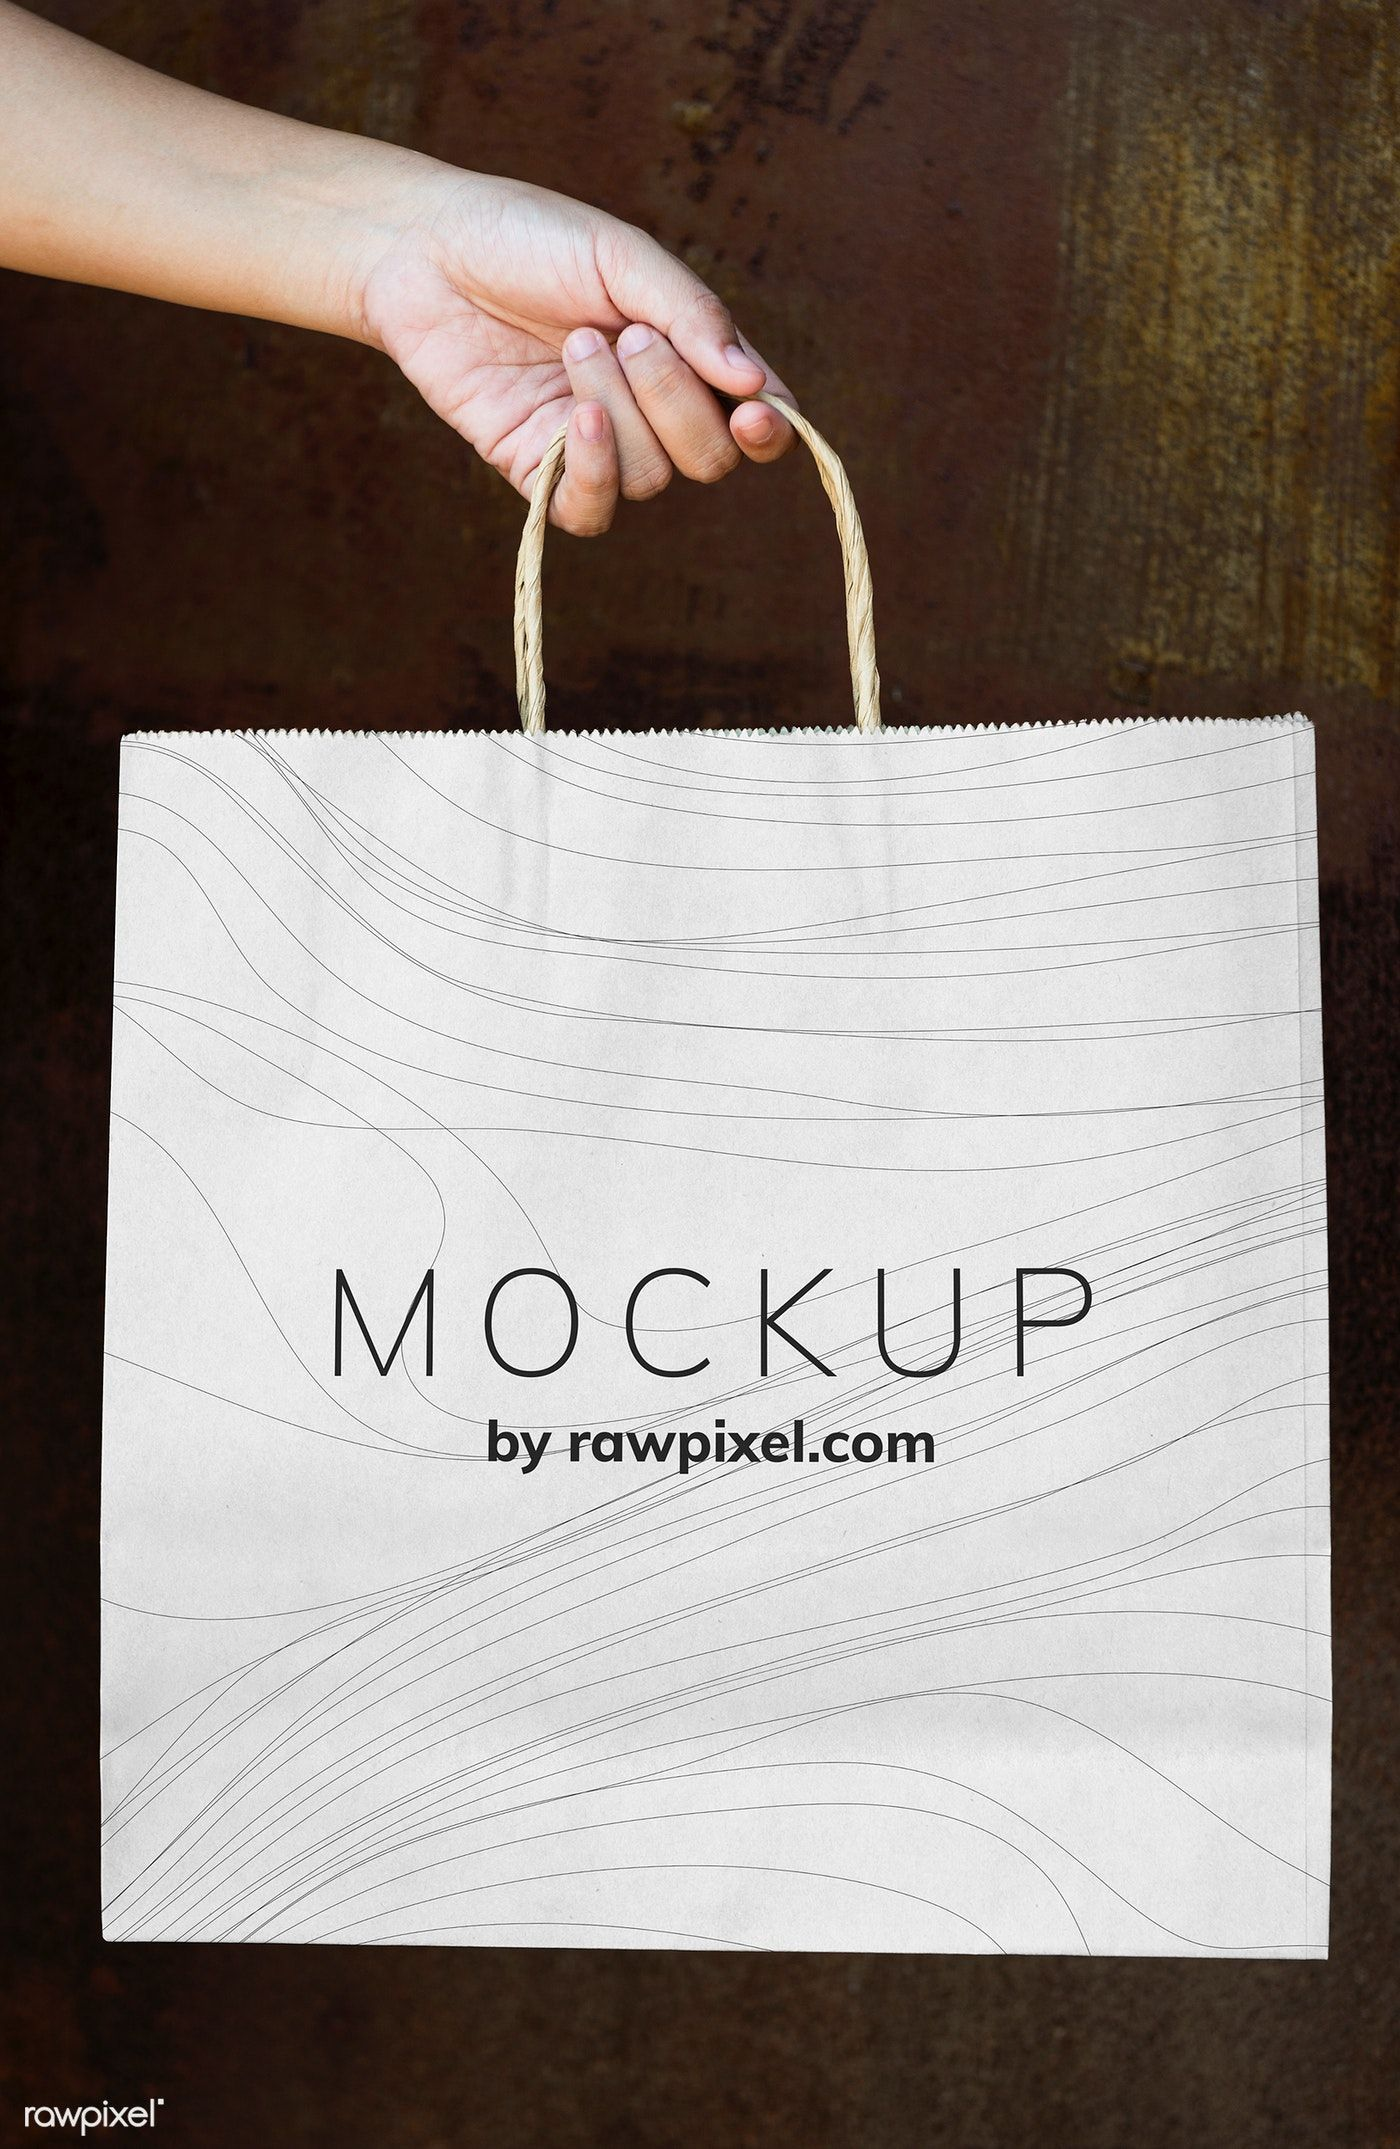 Download Download Premium Psd Of Female Hand Holding A Paper Bag Mockup 502834 Bag Mockup Paper Bag Bags